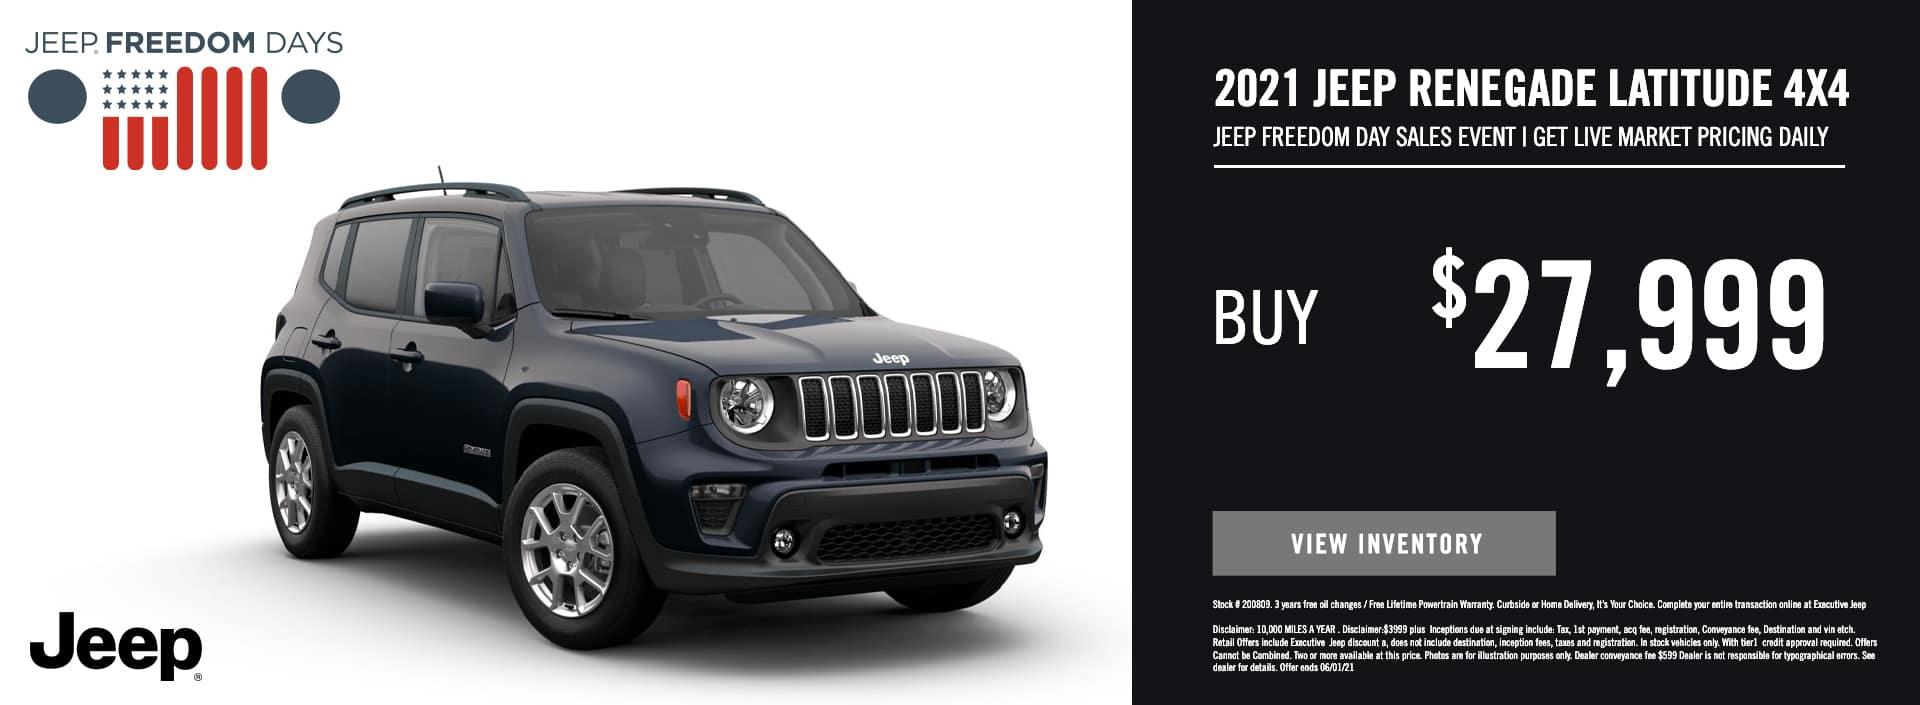 EAG_Jeep_2021 Jeep Renegade Latitude 4×4-2